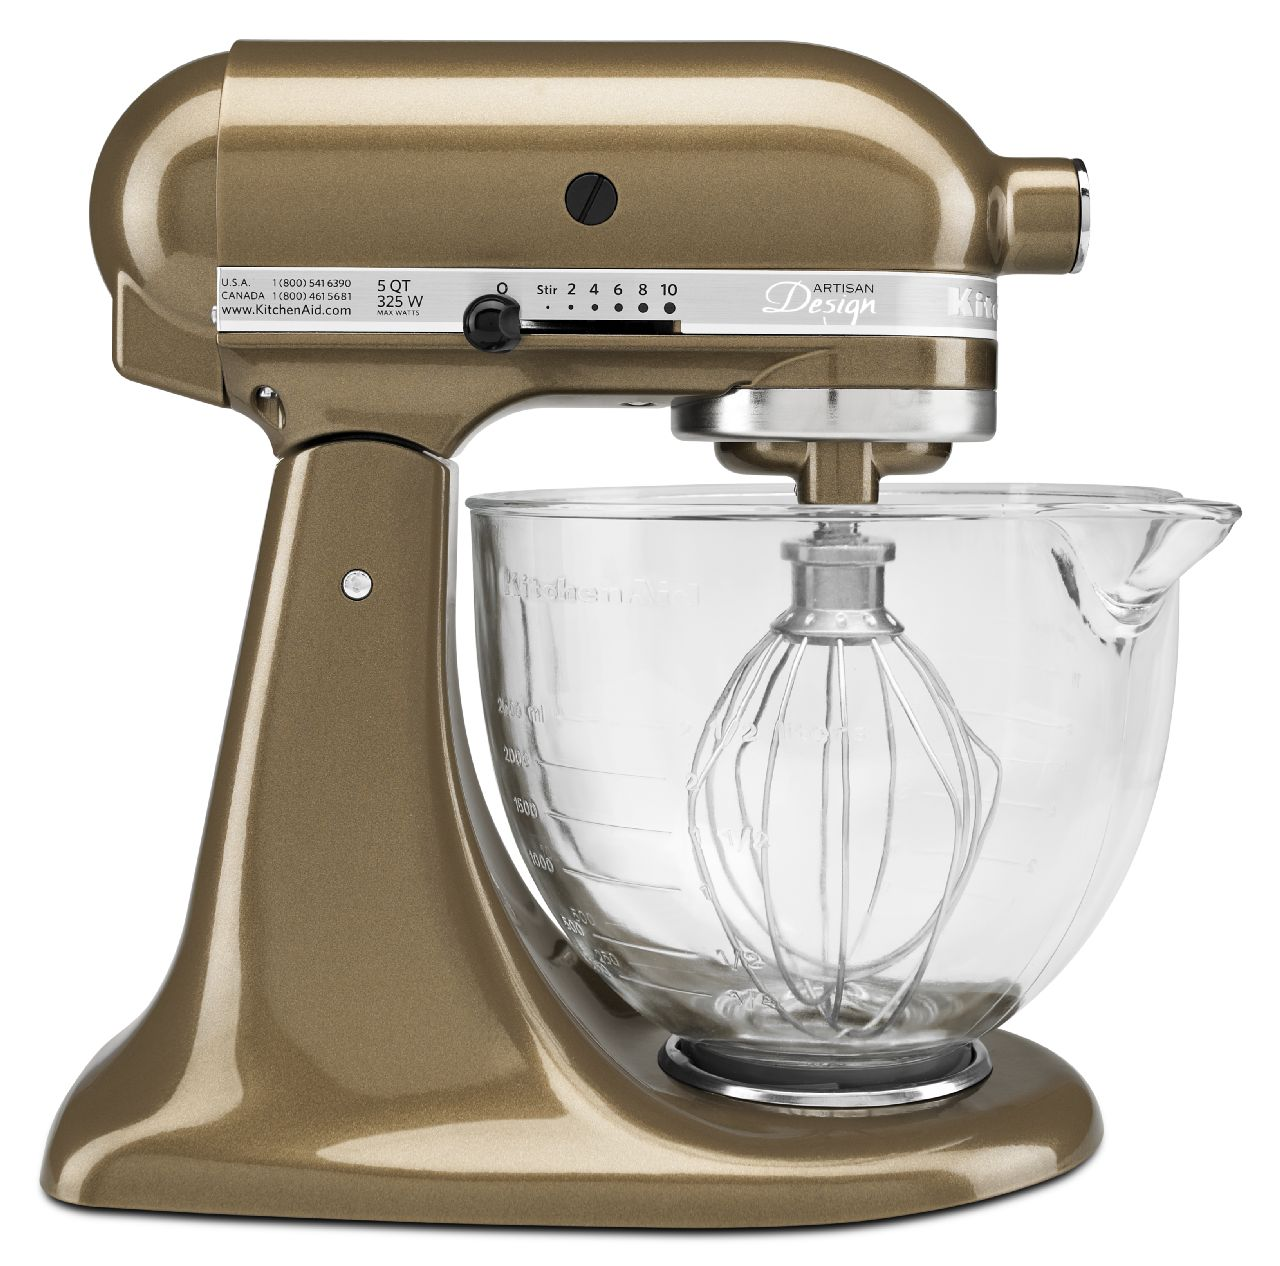 kitchenaid artisan design 5qt tilt head stand mixer glass bowl ksm155gb ebay. Black Bedroom Furniture Sets. Home Design Ideas